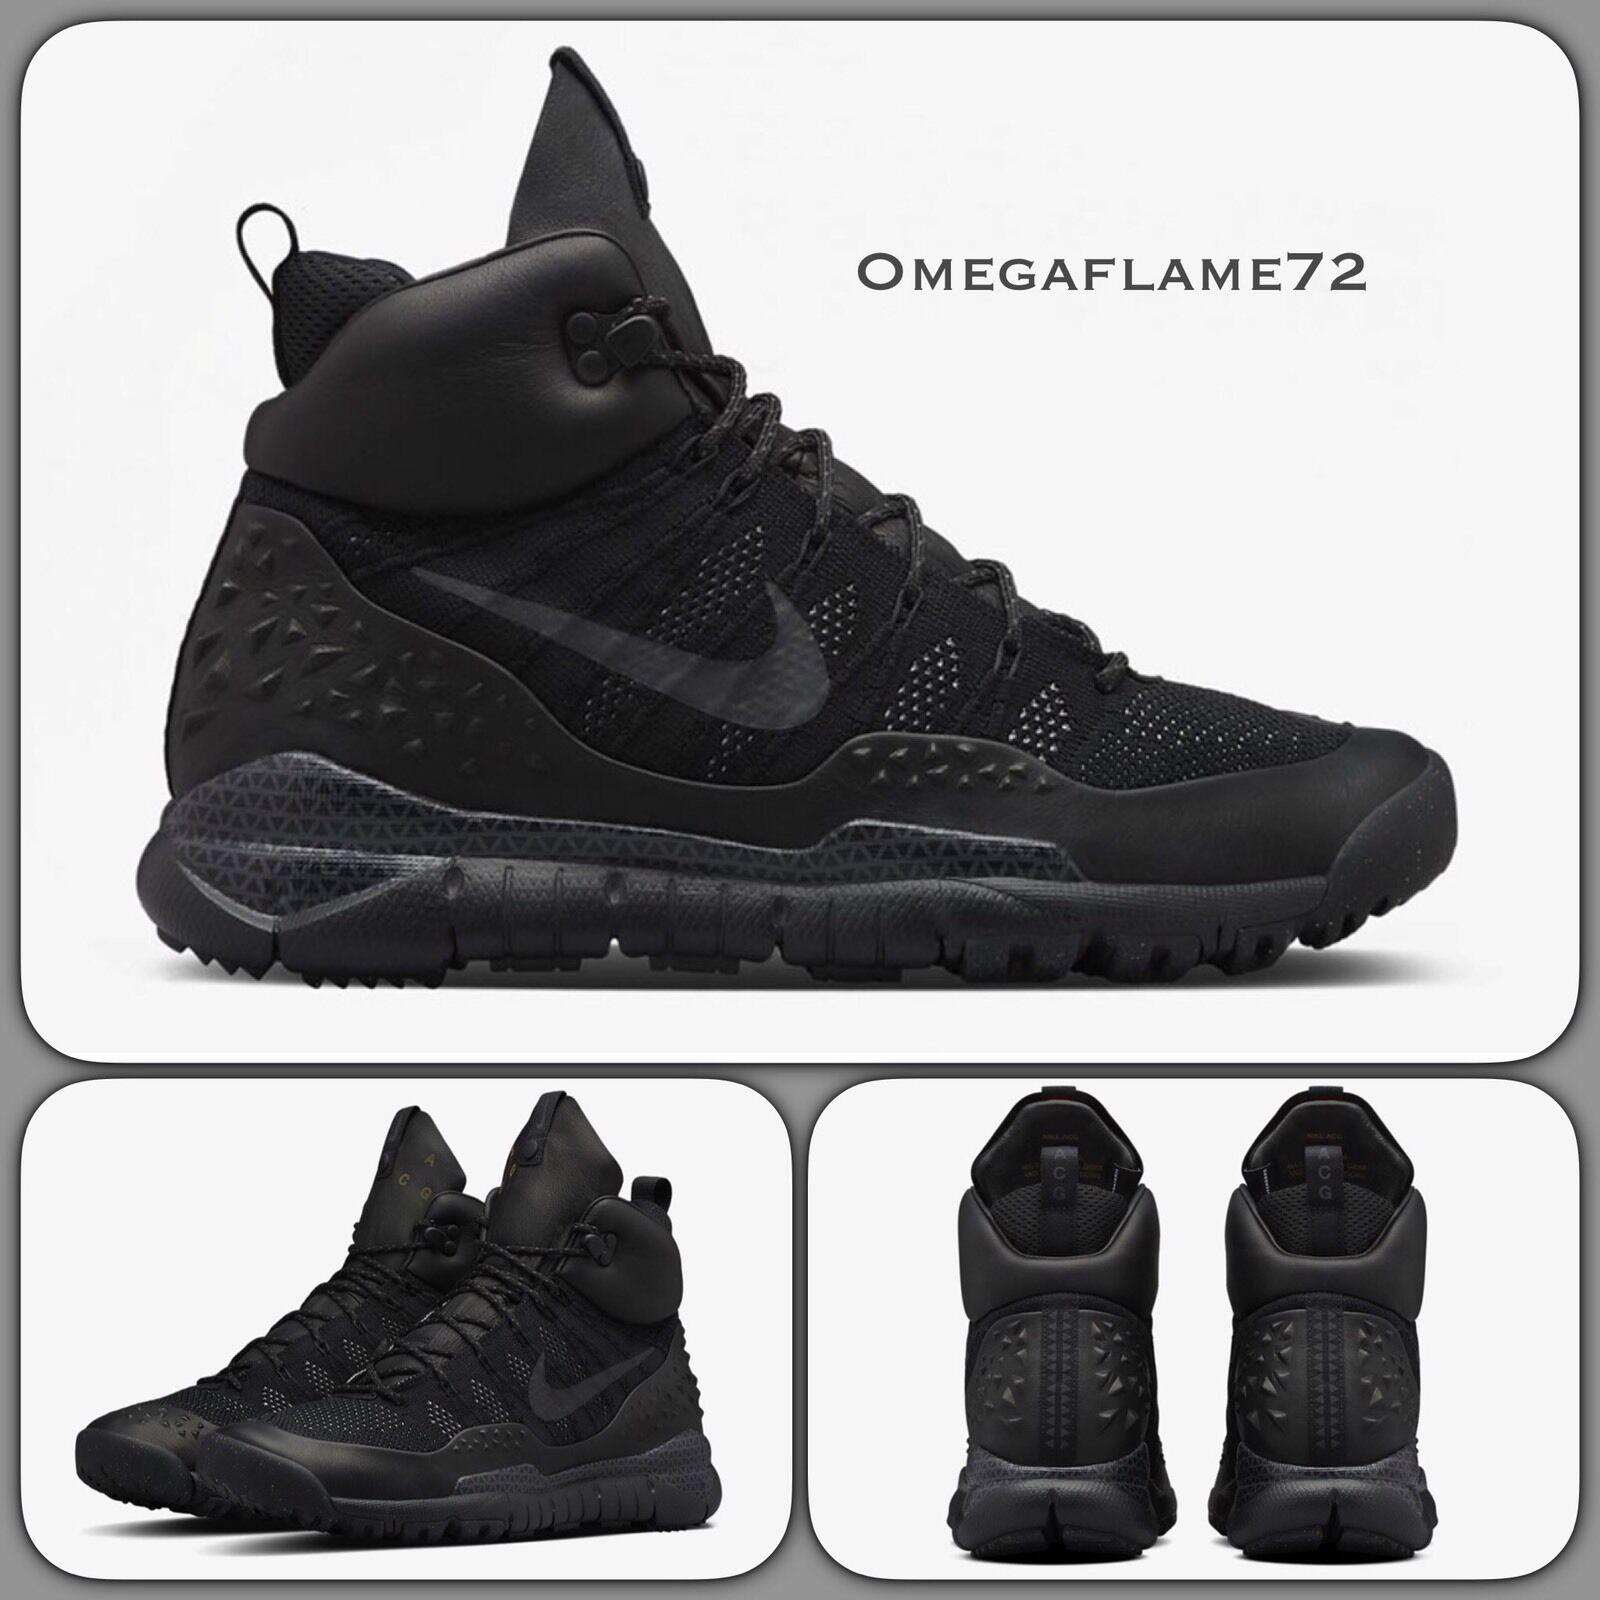 Nike Lupinek Flyknit ACG 826077-002 Reino Reino 826077-002 Unido 12 EE. UU. 13 Negro Negro cfb056